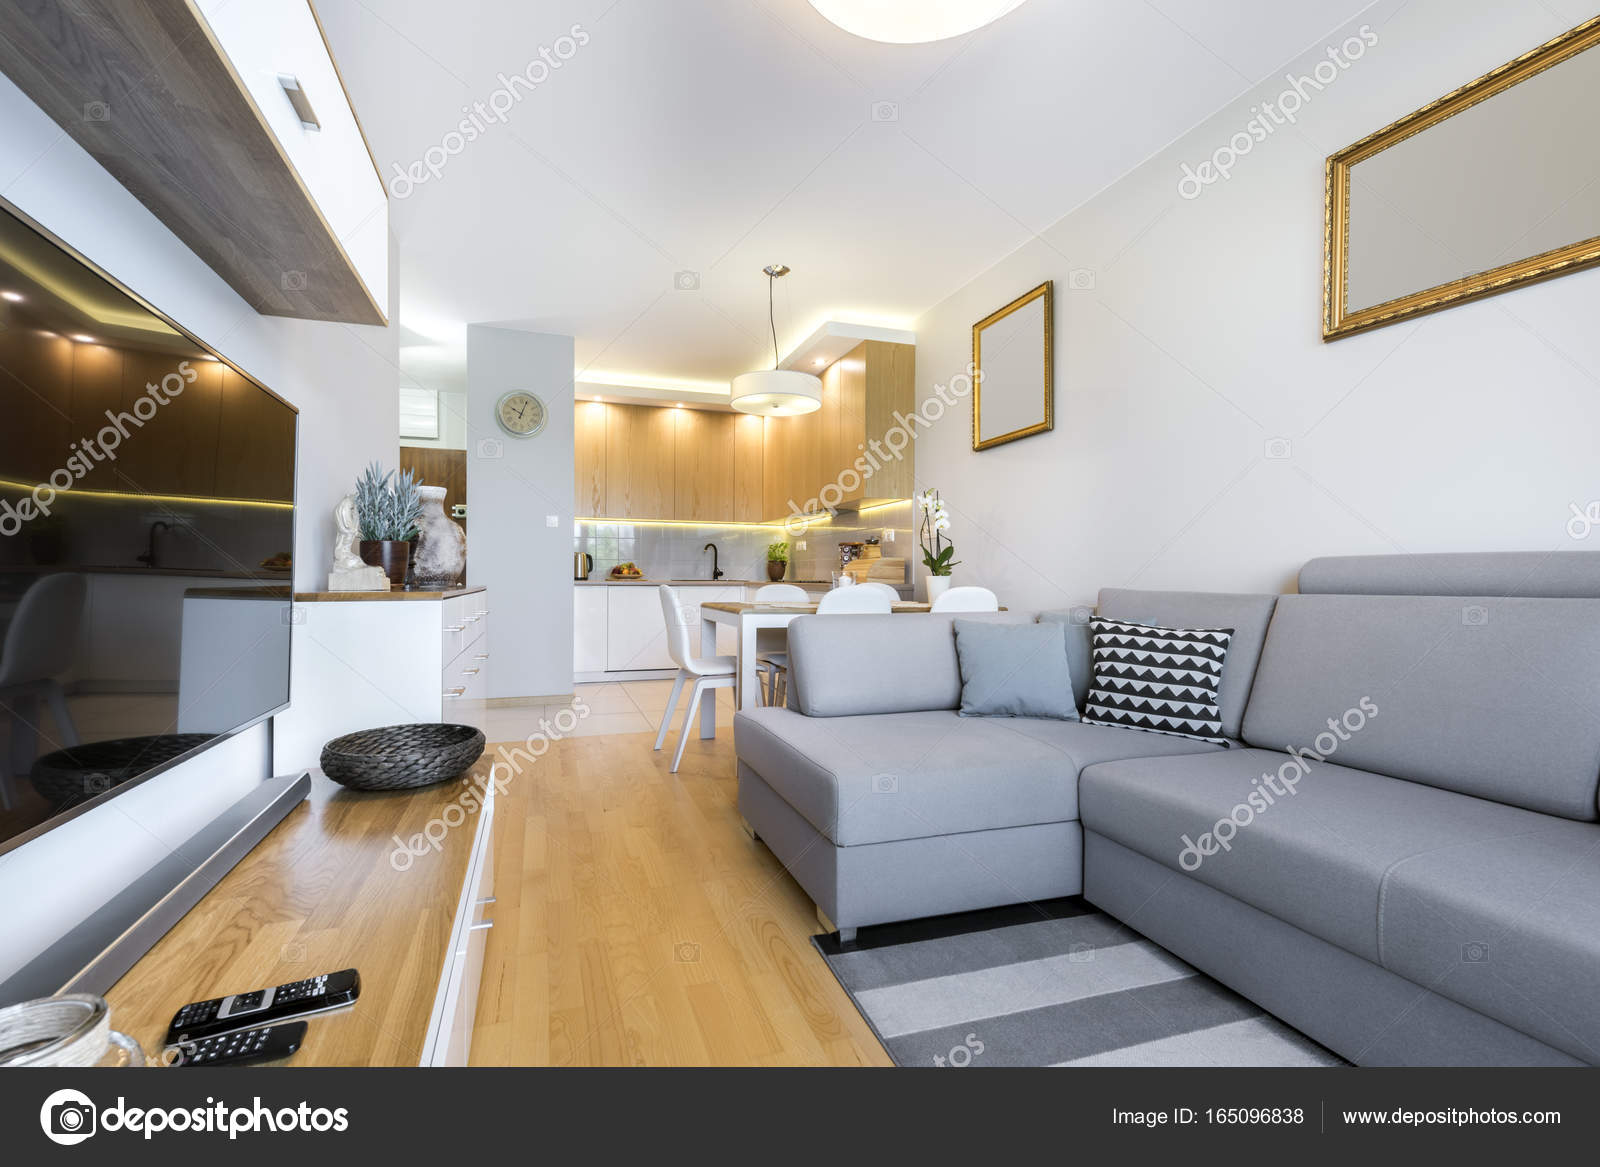 modern interieur woonkamer — Stockfoto © jacek_kadaj #165096838